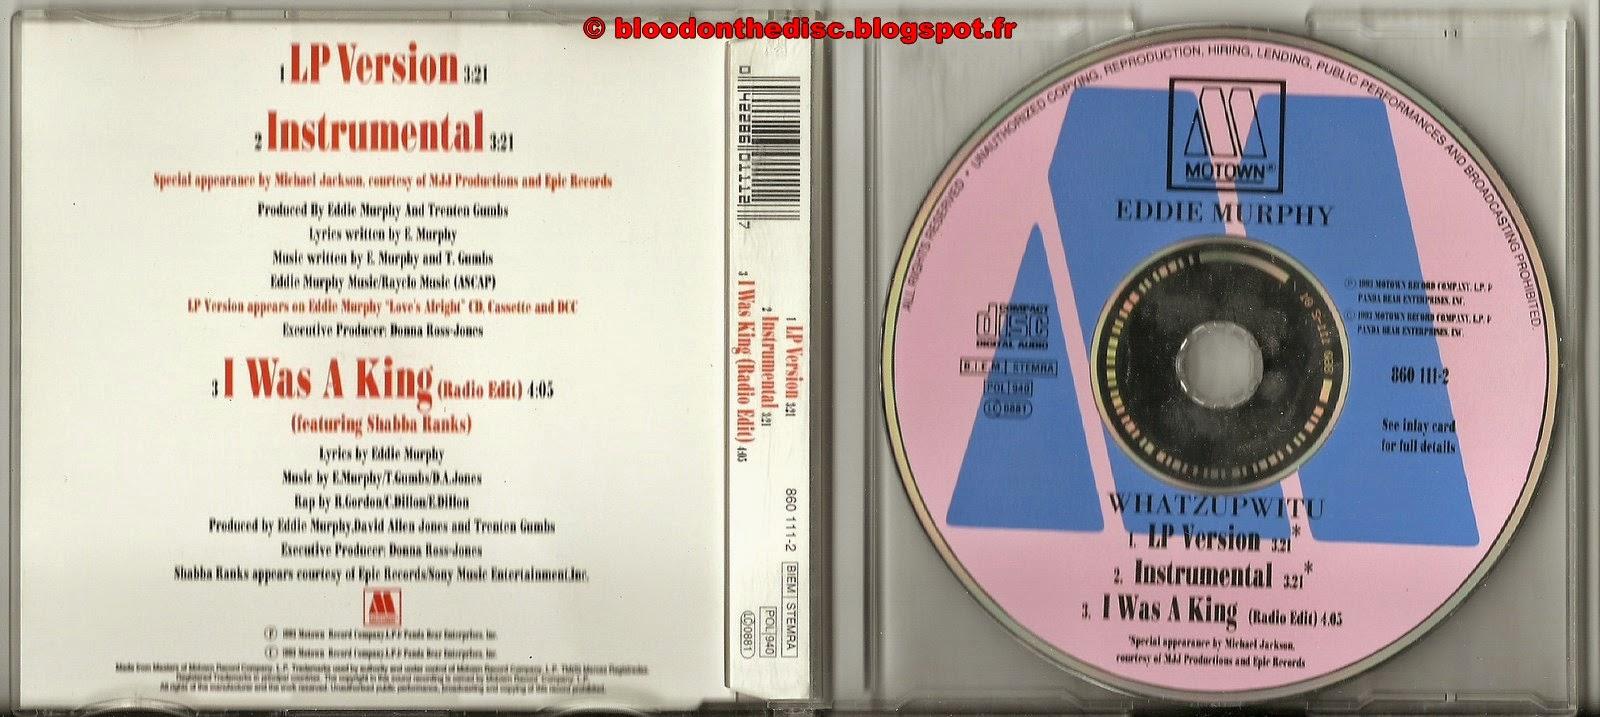 Whatzupwitu Maxi CD